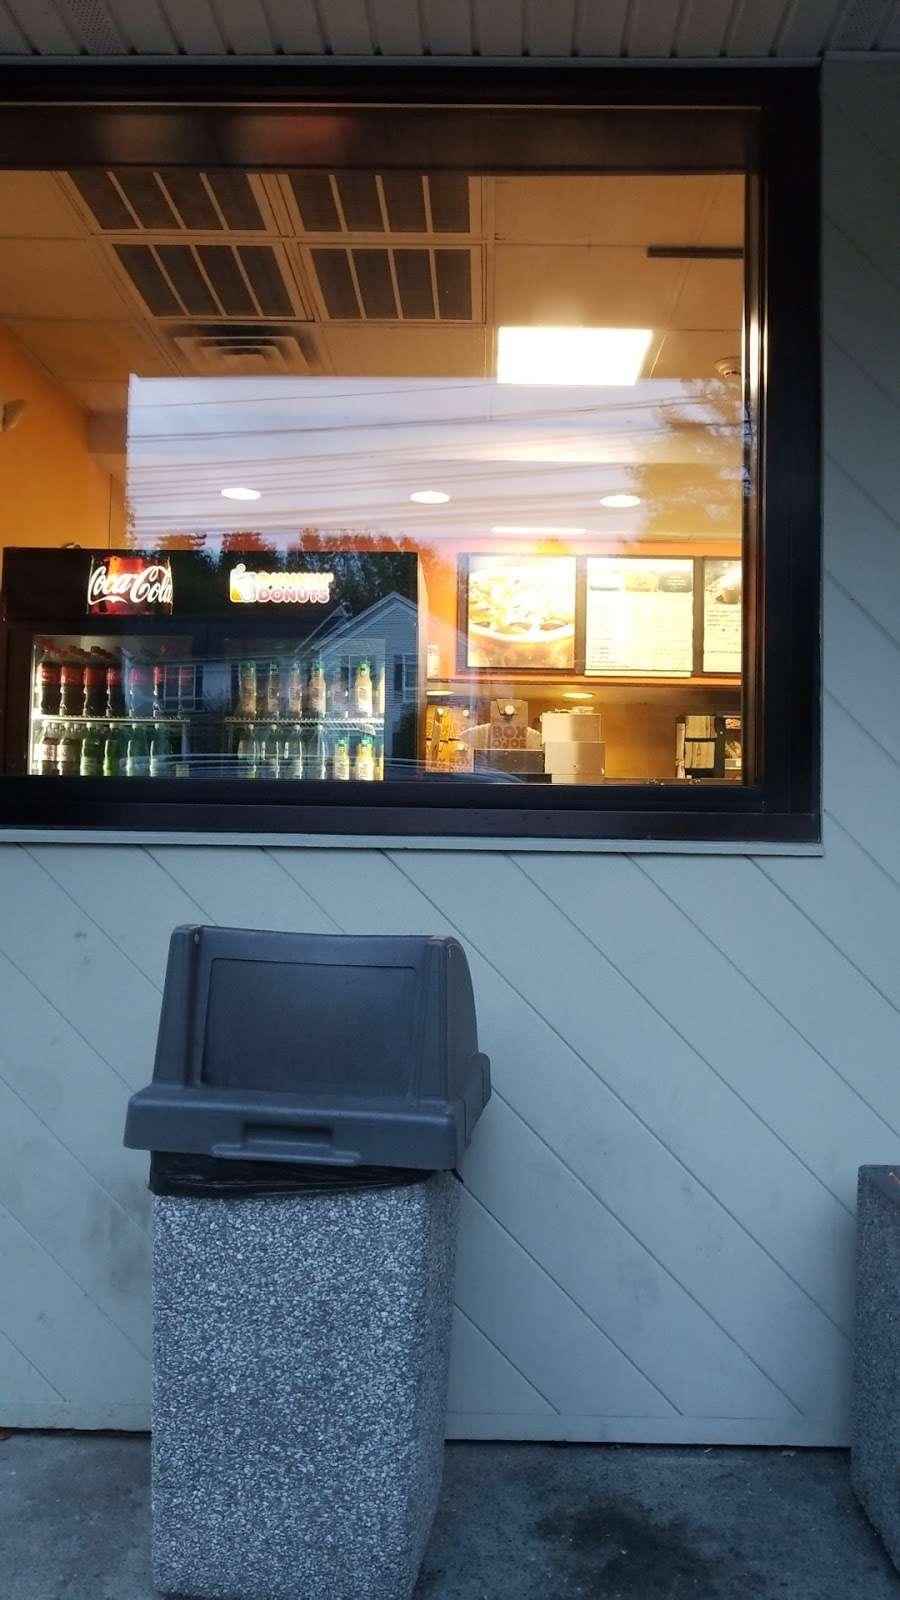 Dunkin - cafe  | Photo 9 of 10 | Address: 238 Grove St, Braintree, MA 02184, USA | Phone: (781) 849-0815